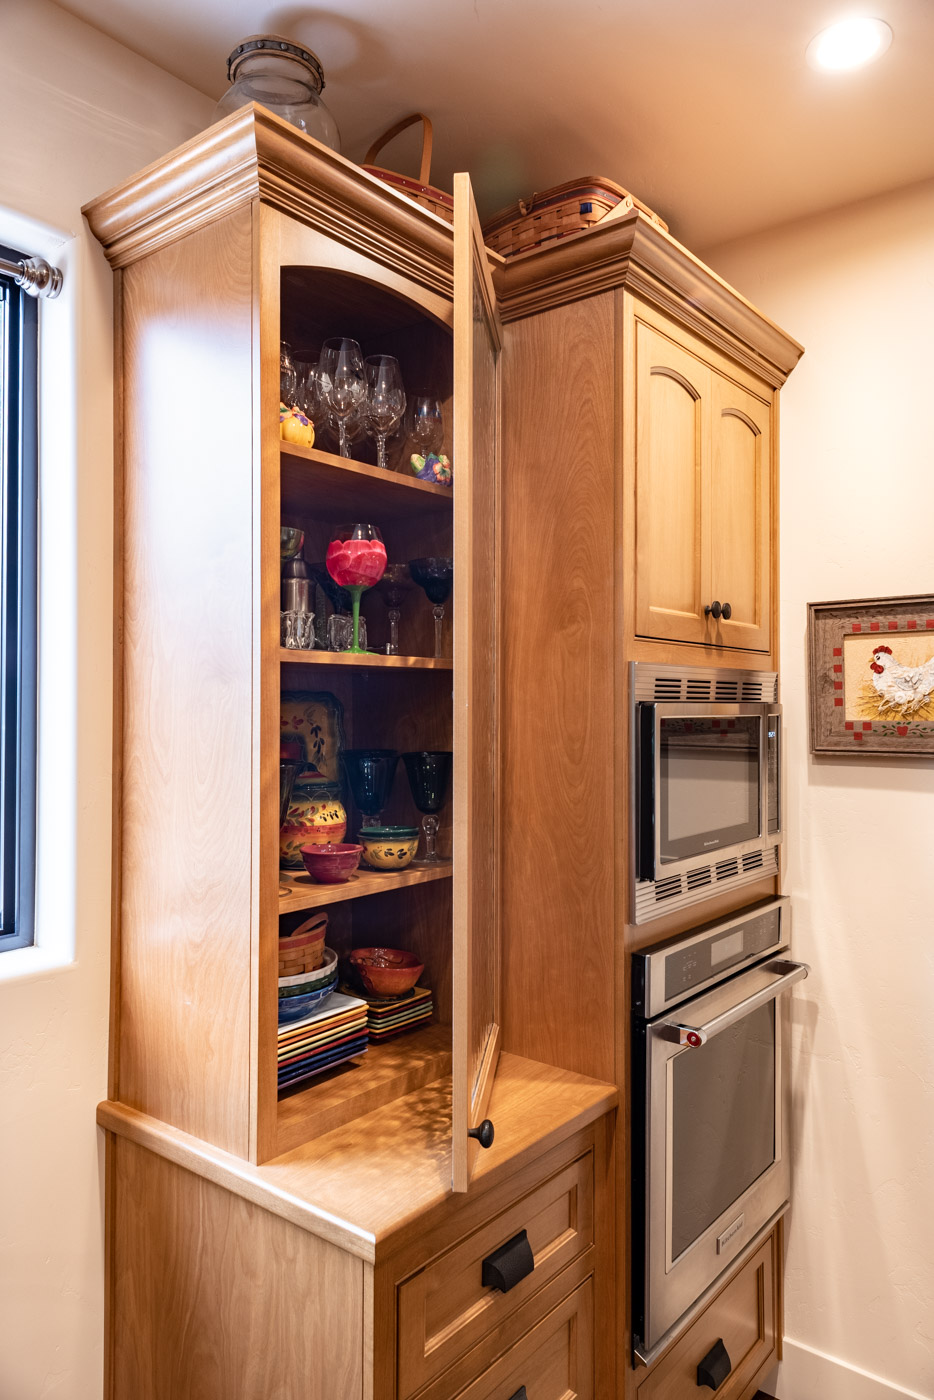 Tuscan Artisan custom stained Alder wood kitchen cabinet display